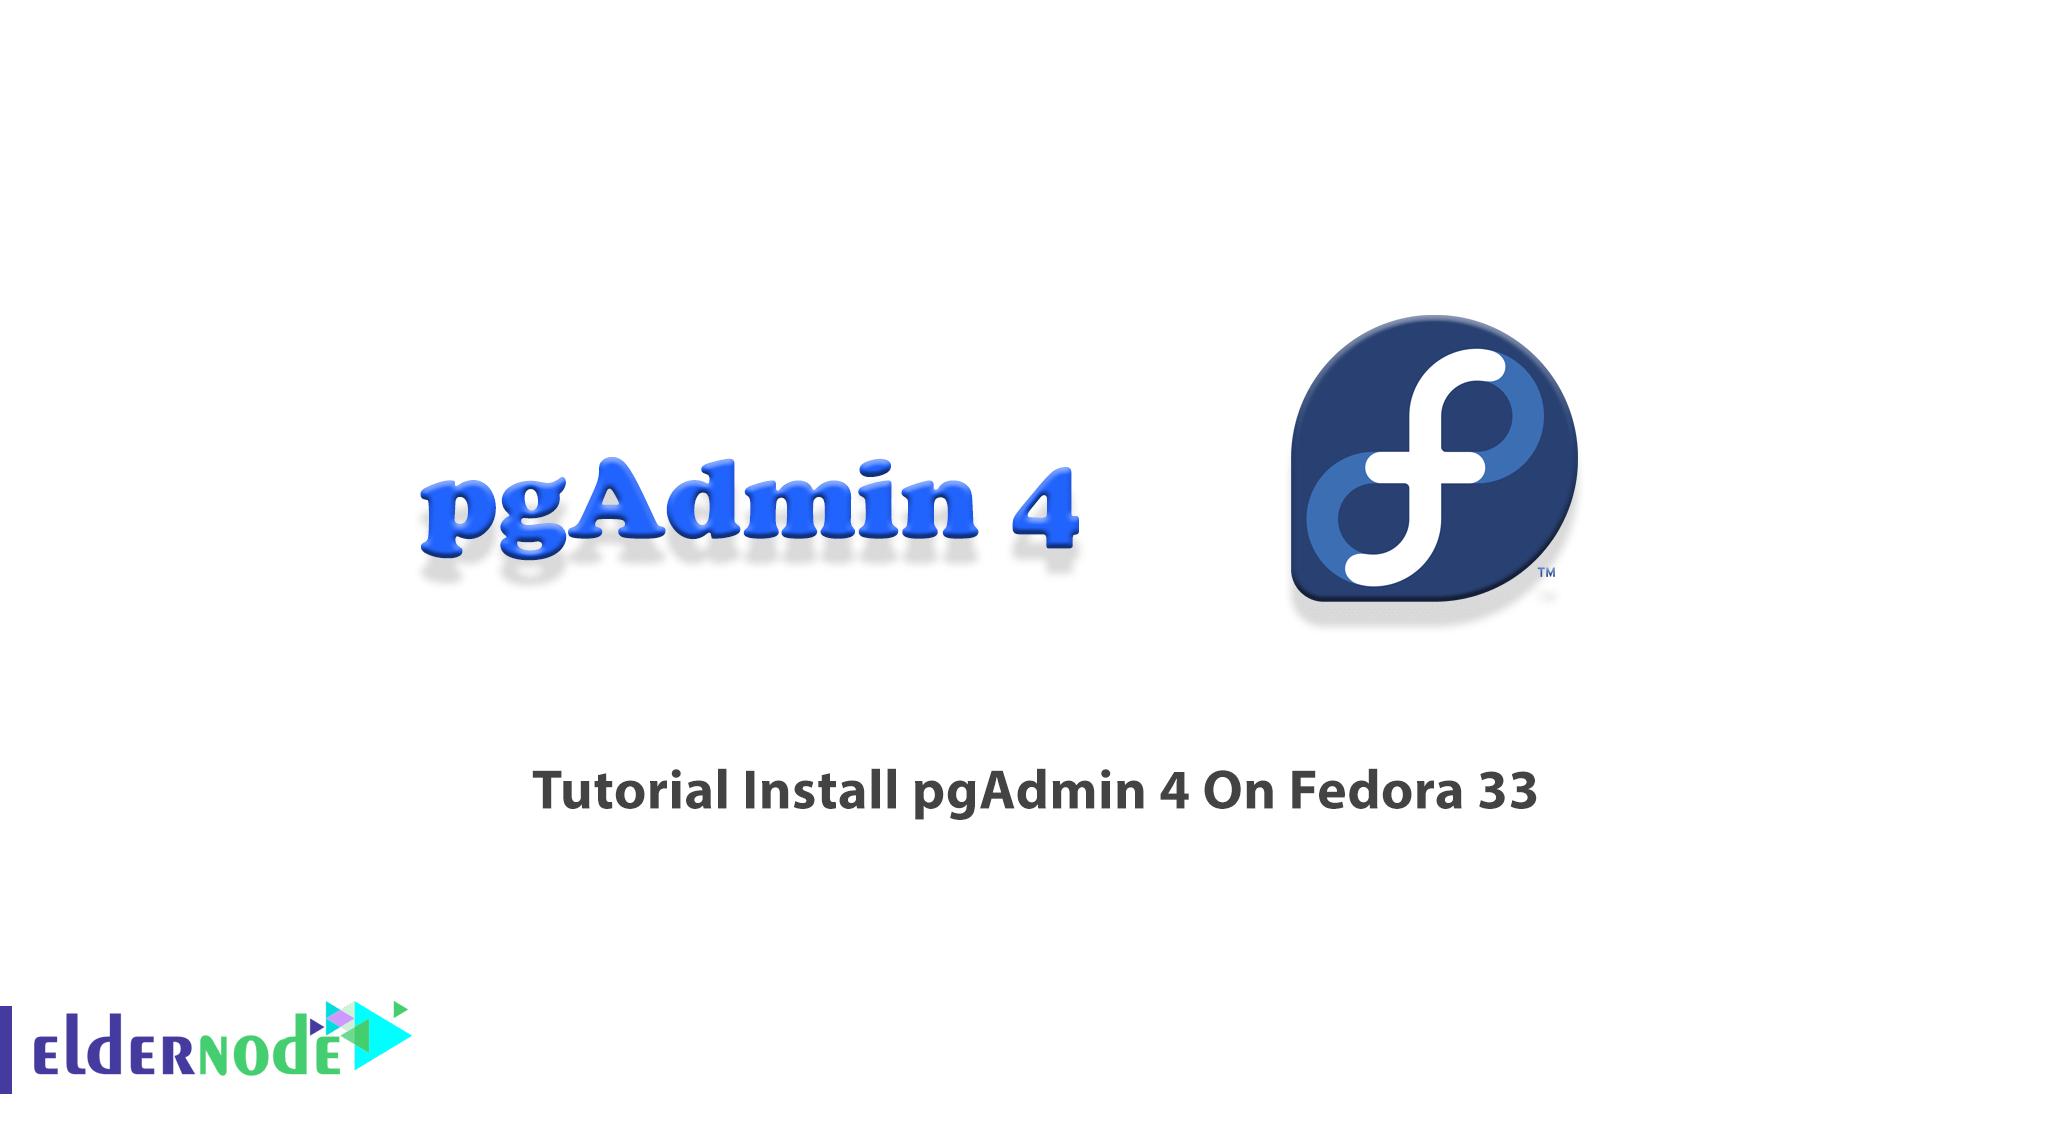 Tutorial Install pgAdmin 4 On Fedora 33